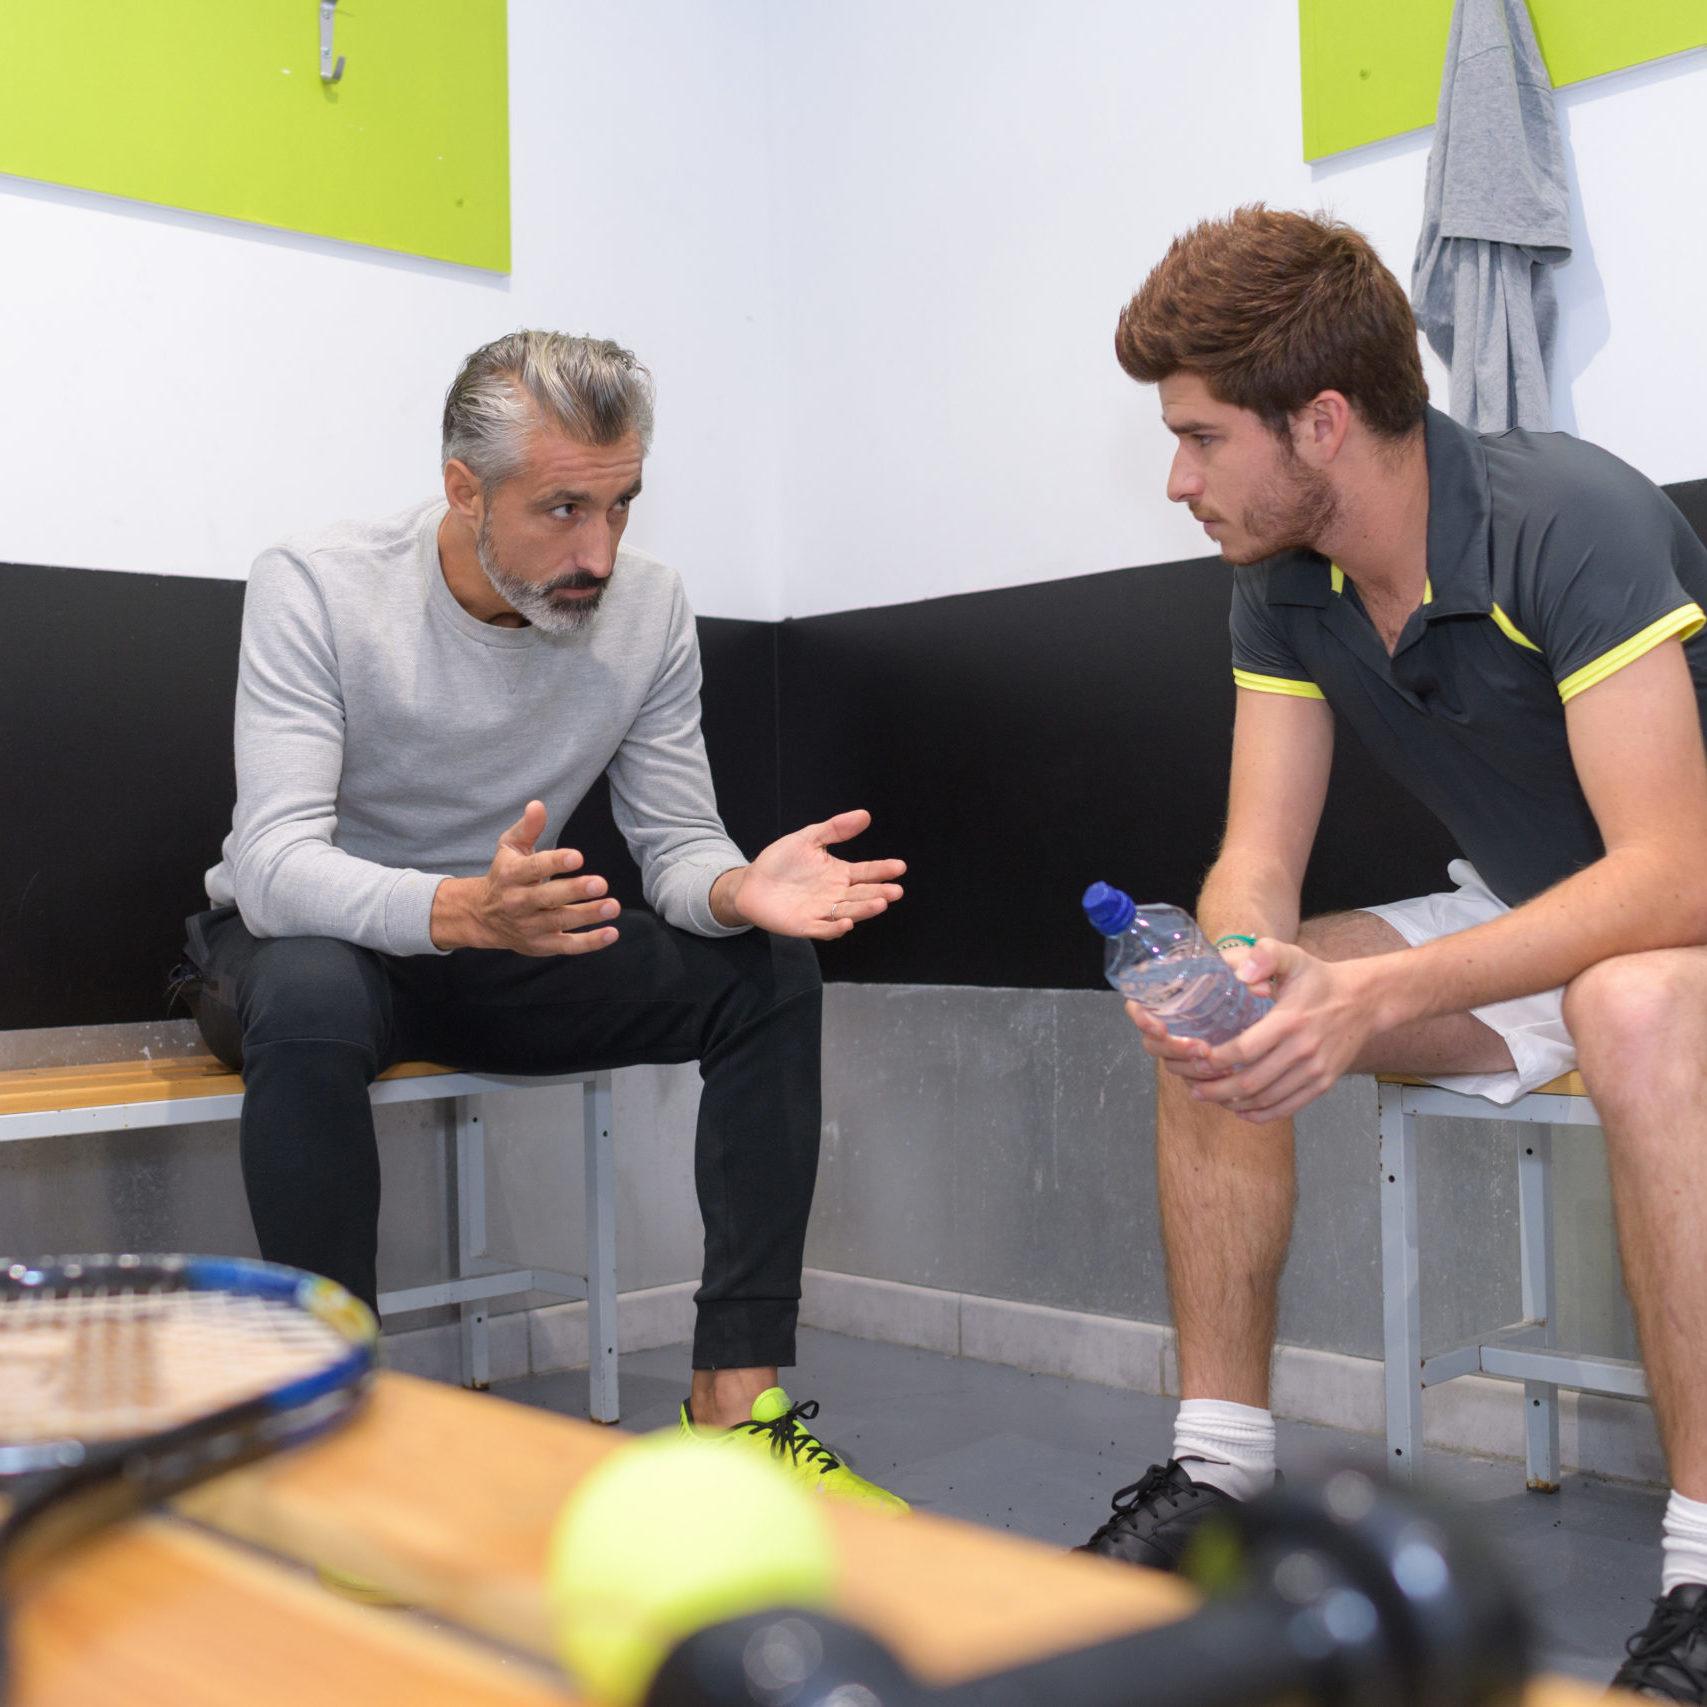 coach talking to tenis player in locker room